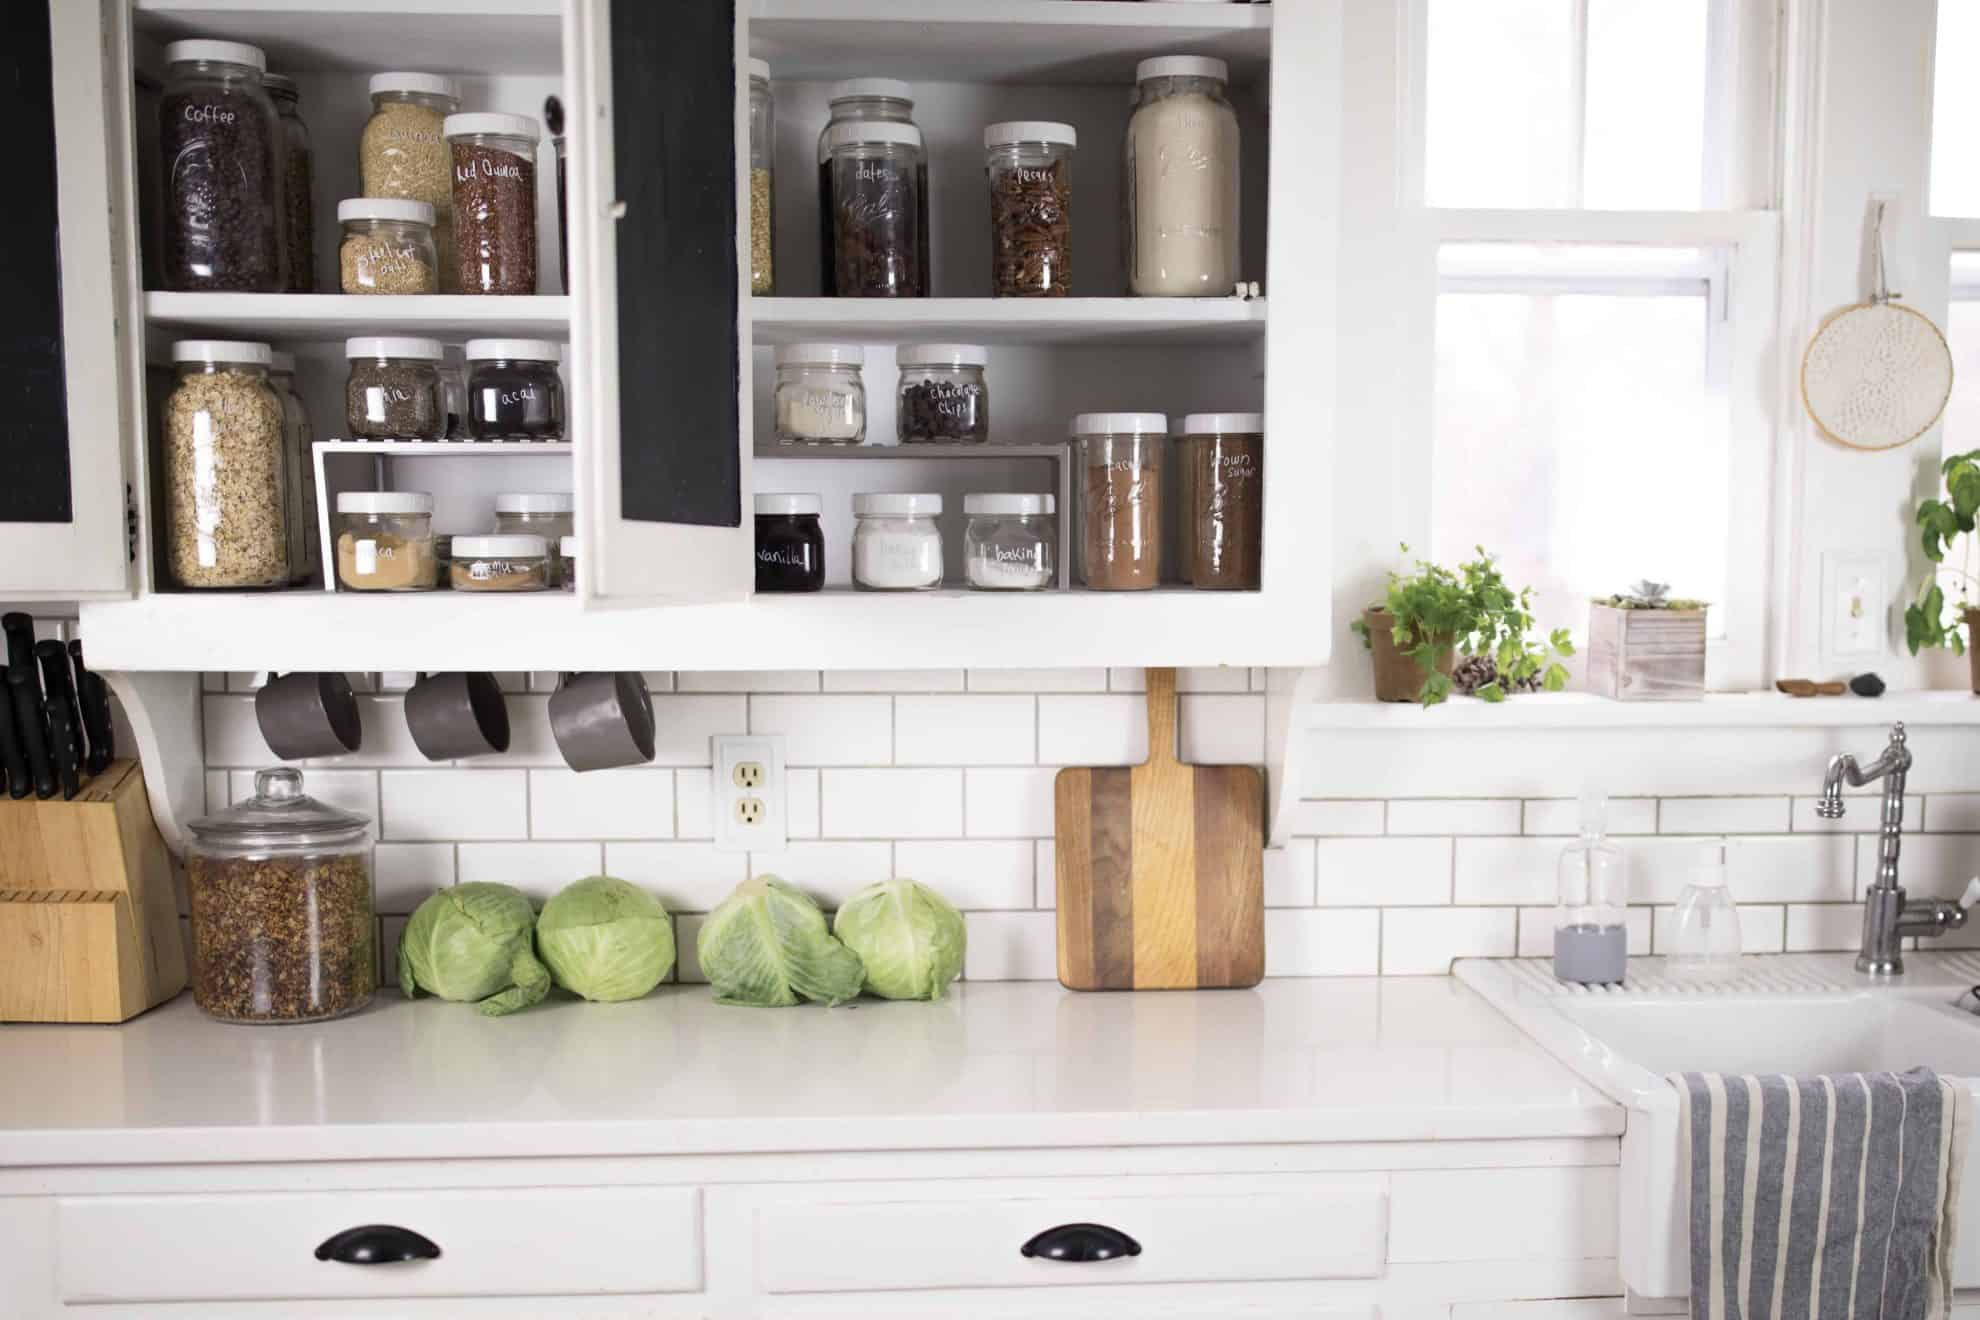 Farmhouse Kitchen Cabinet Organization with Mason Jars